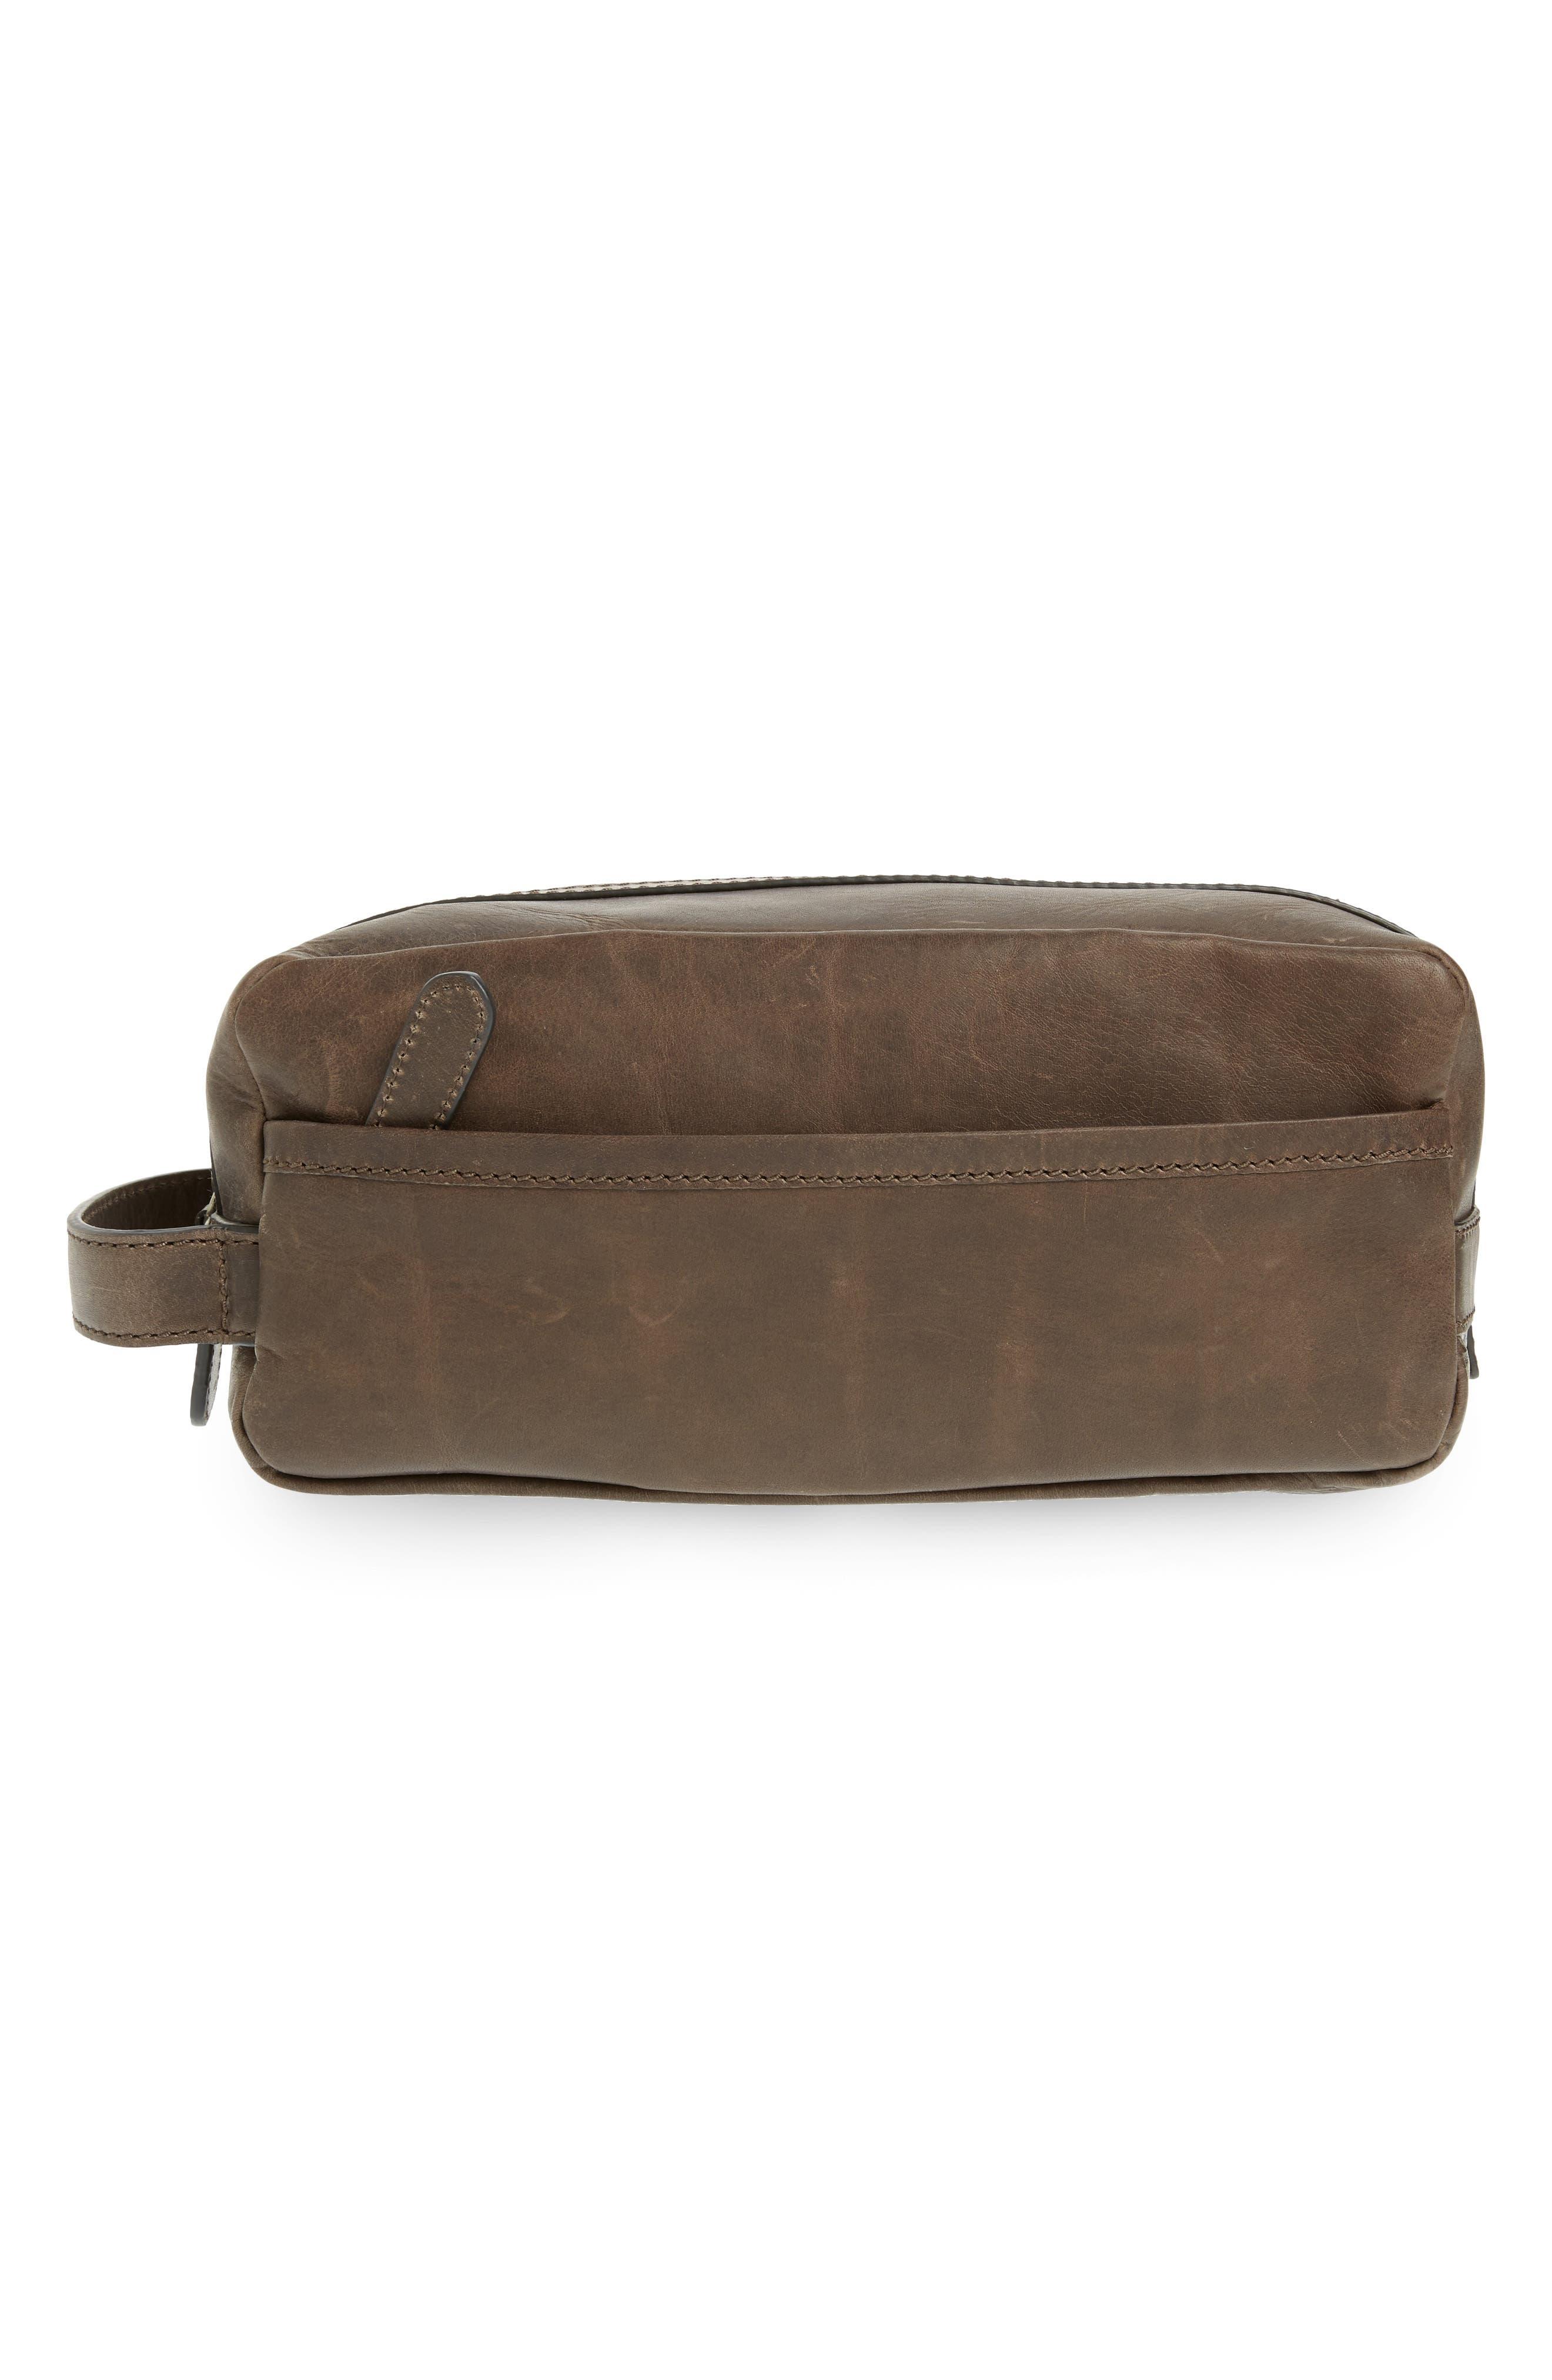 'Logan' Leather Travel Kit